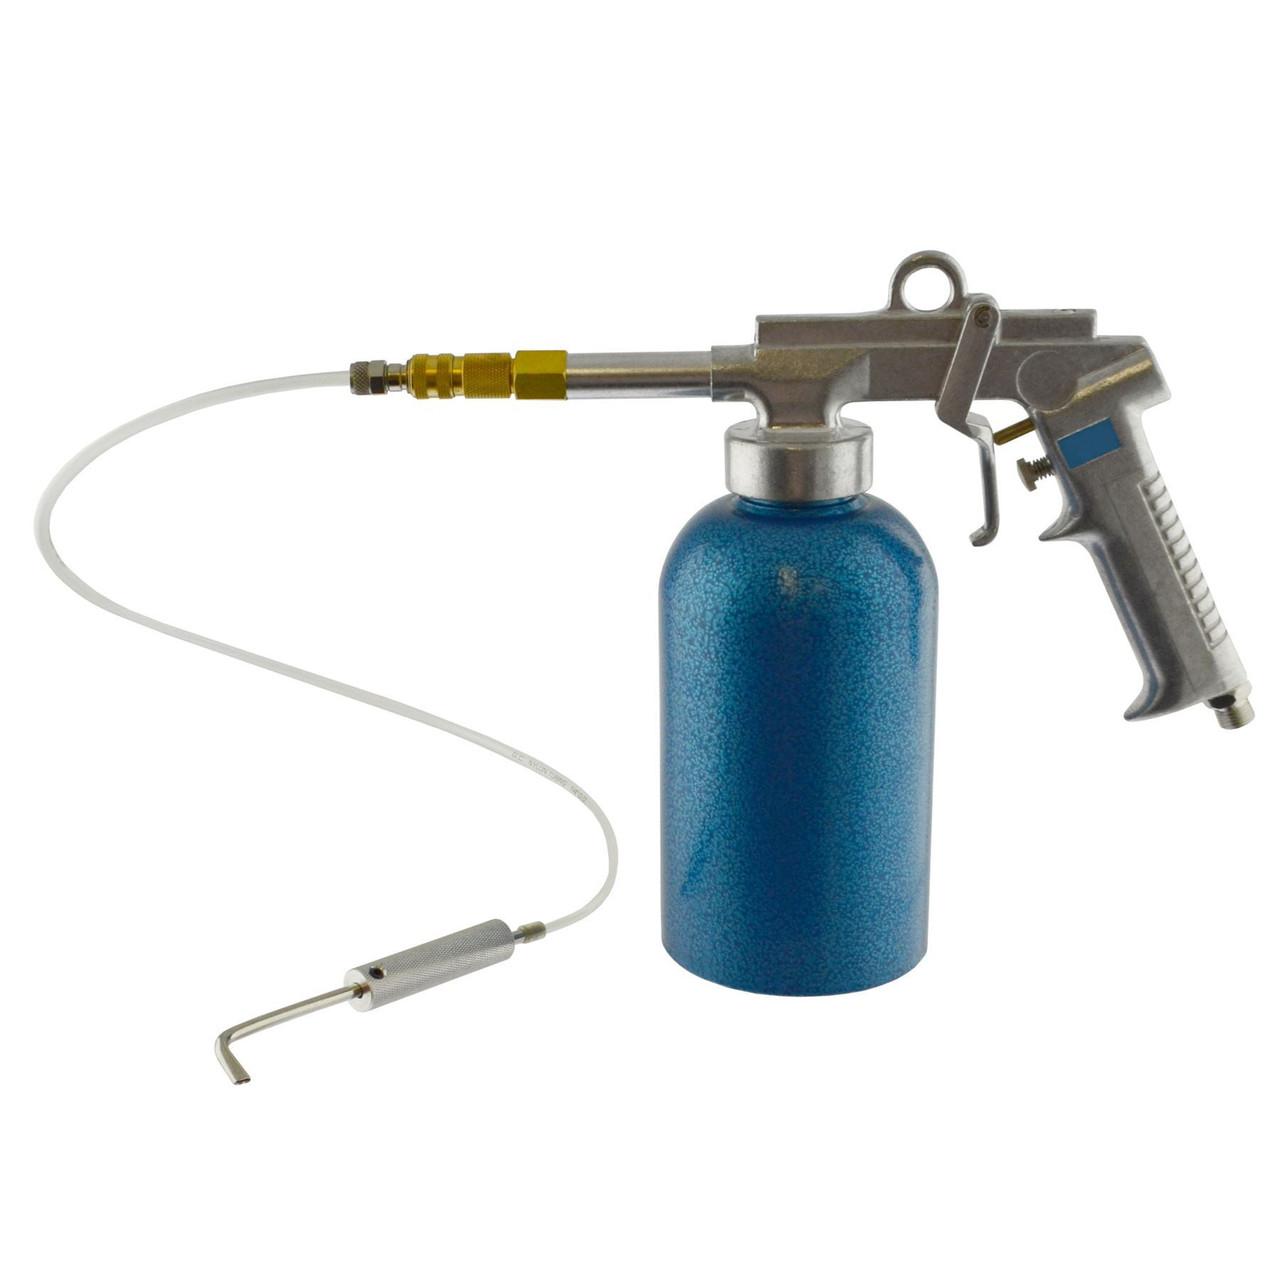 Rust Proofing Wax Injection Gun And Unifine Underseal Undercoating Gun Waxoyl